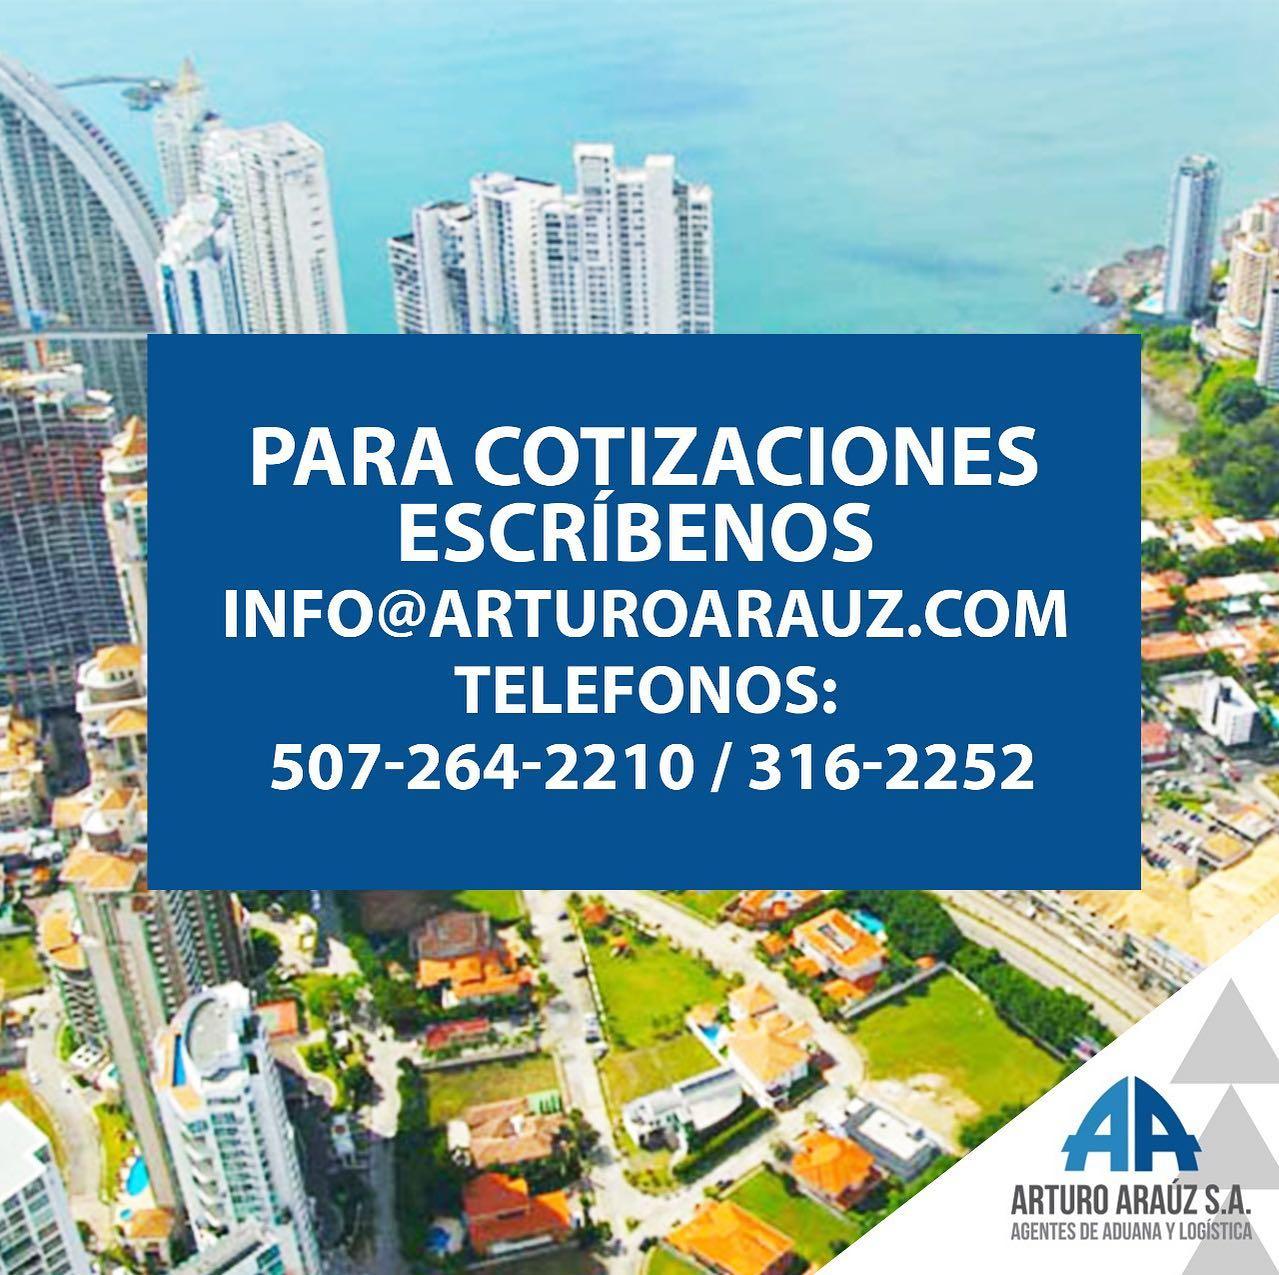 Arturo Araúz Int., S.A.